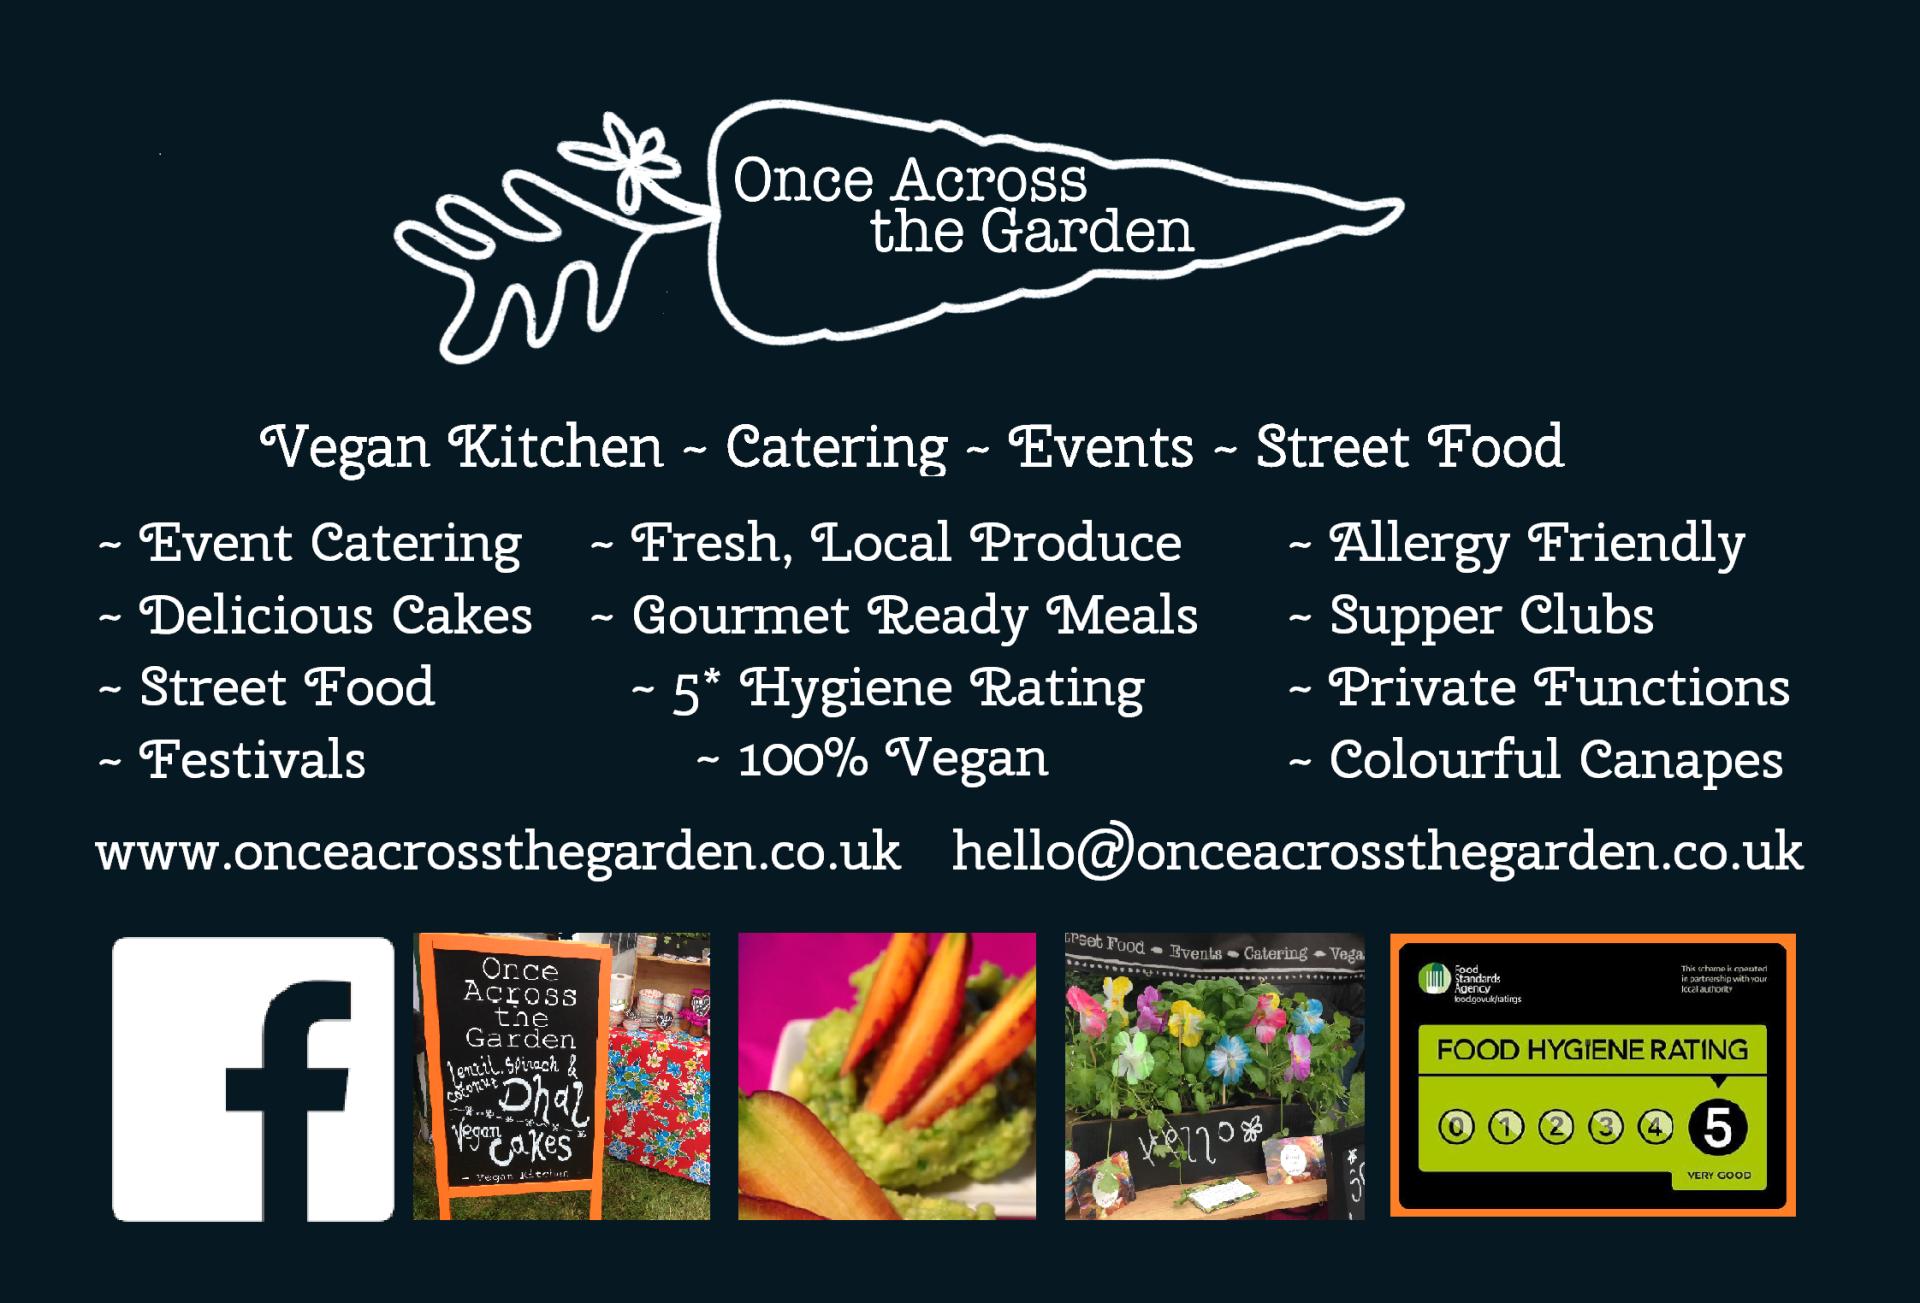 vegan, wedding, weddings, UK, cake, cakes, caterers, Yorkshire, York, food